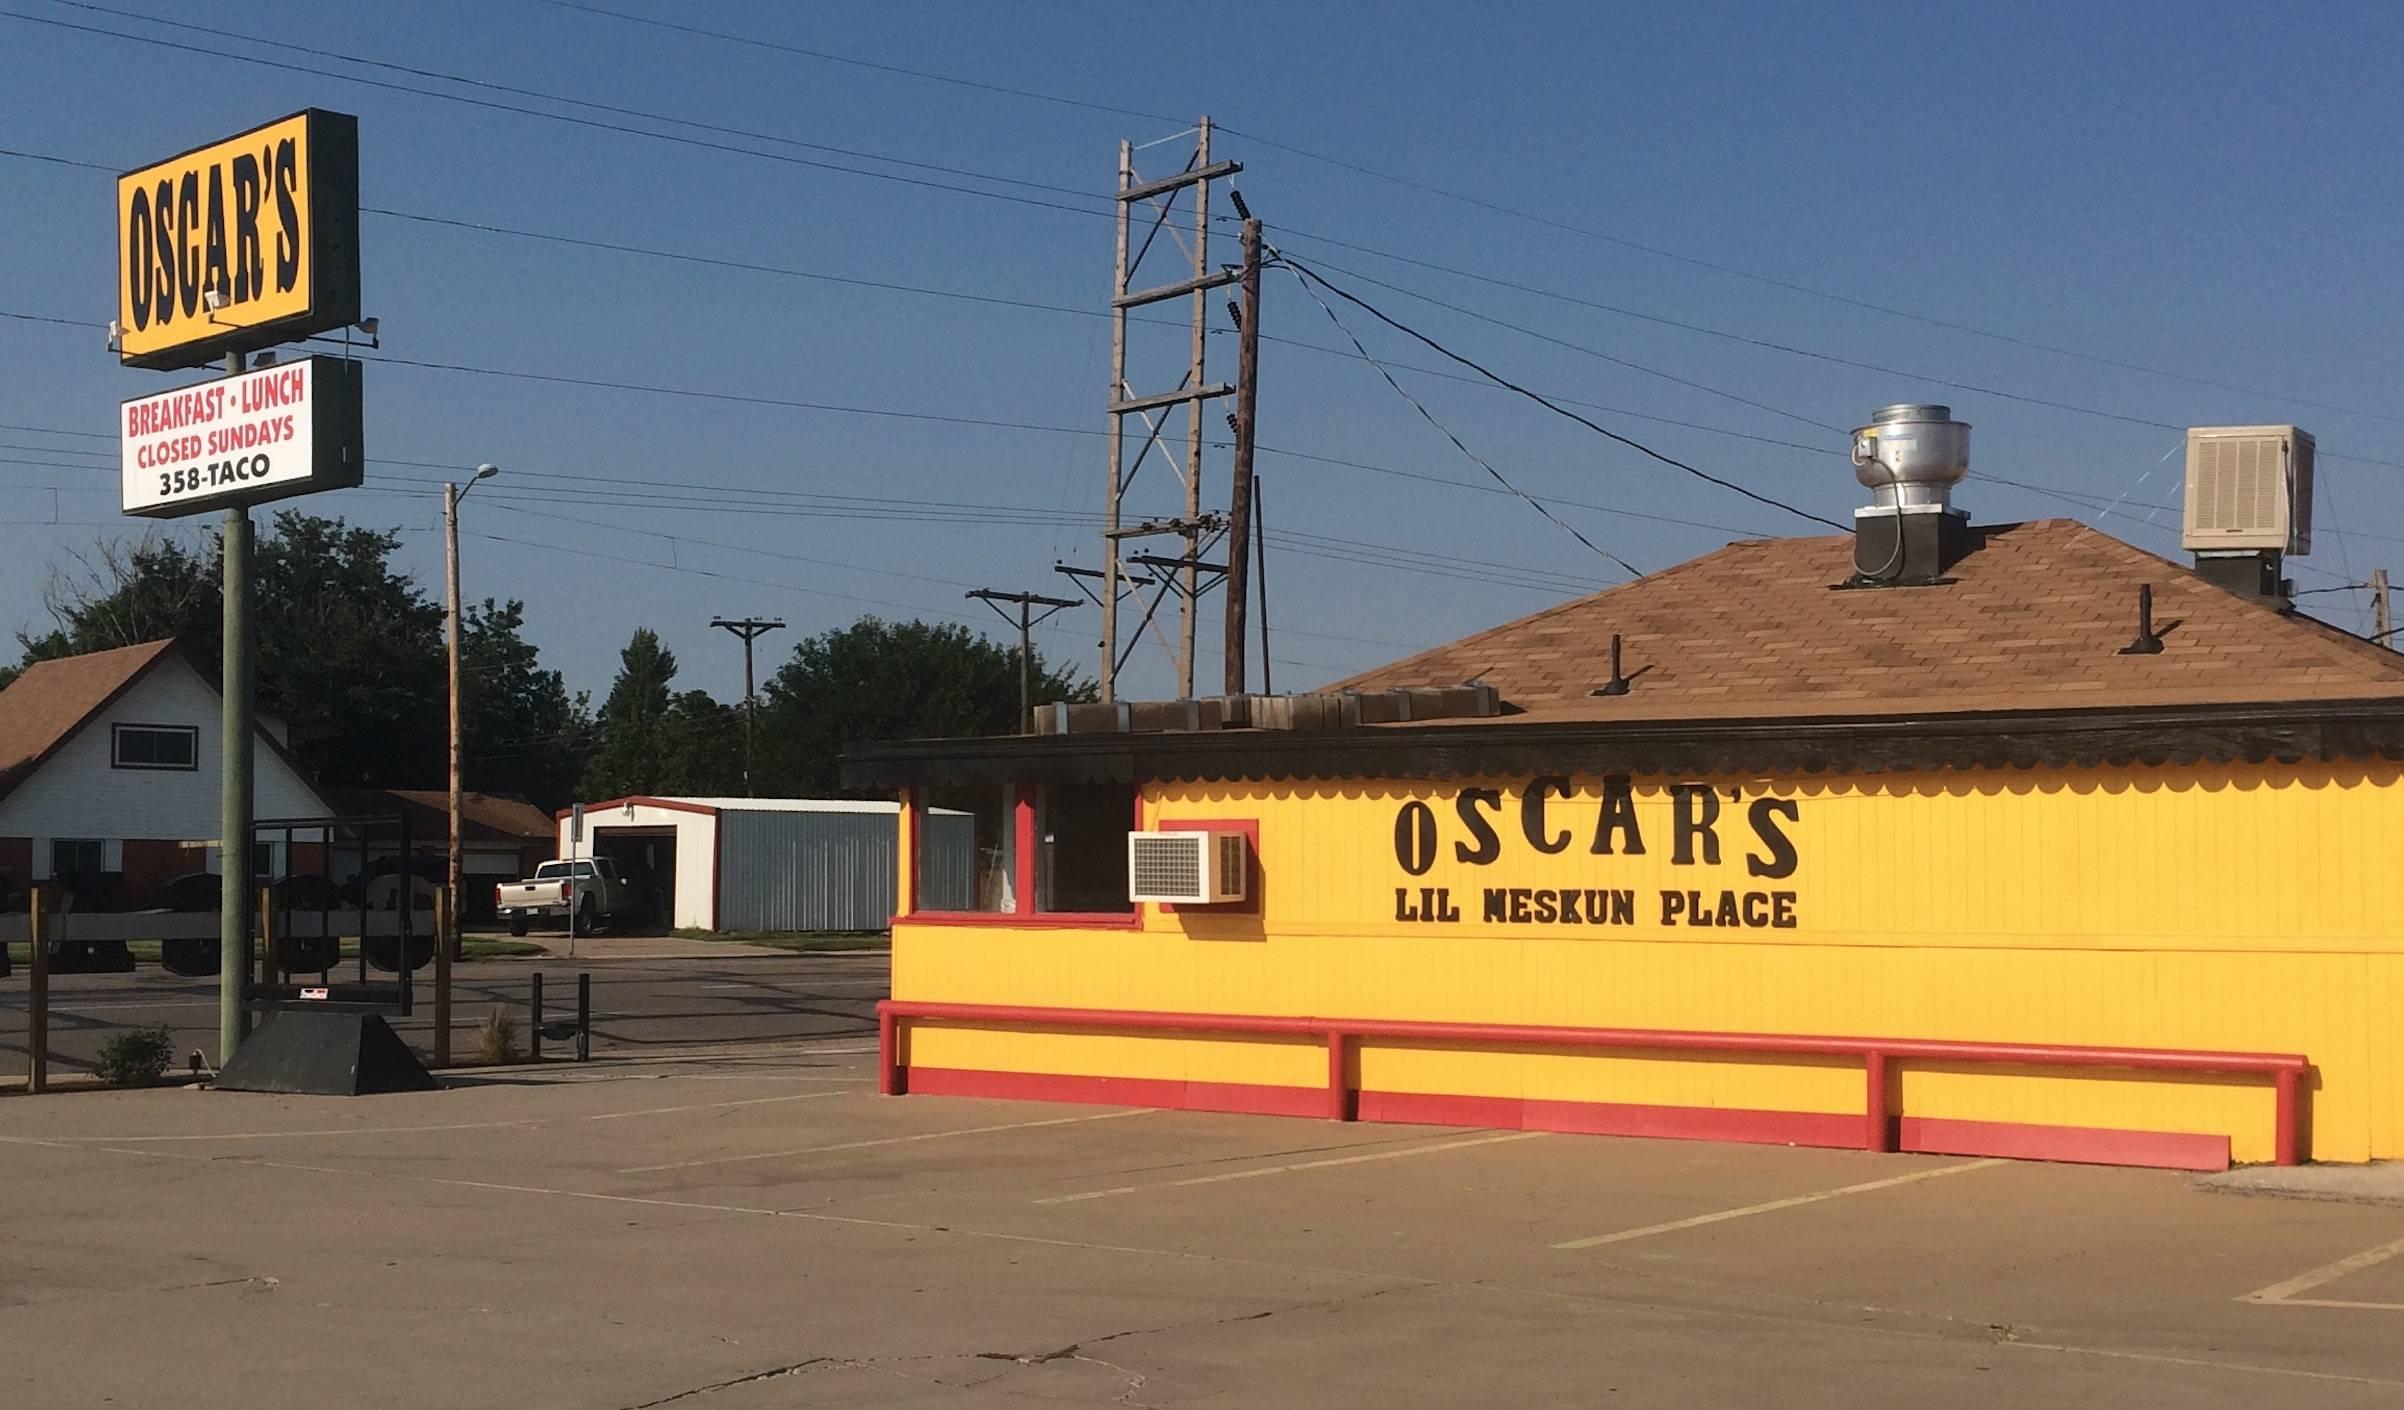 Oscar's puts in a sequel in Amarillo